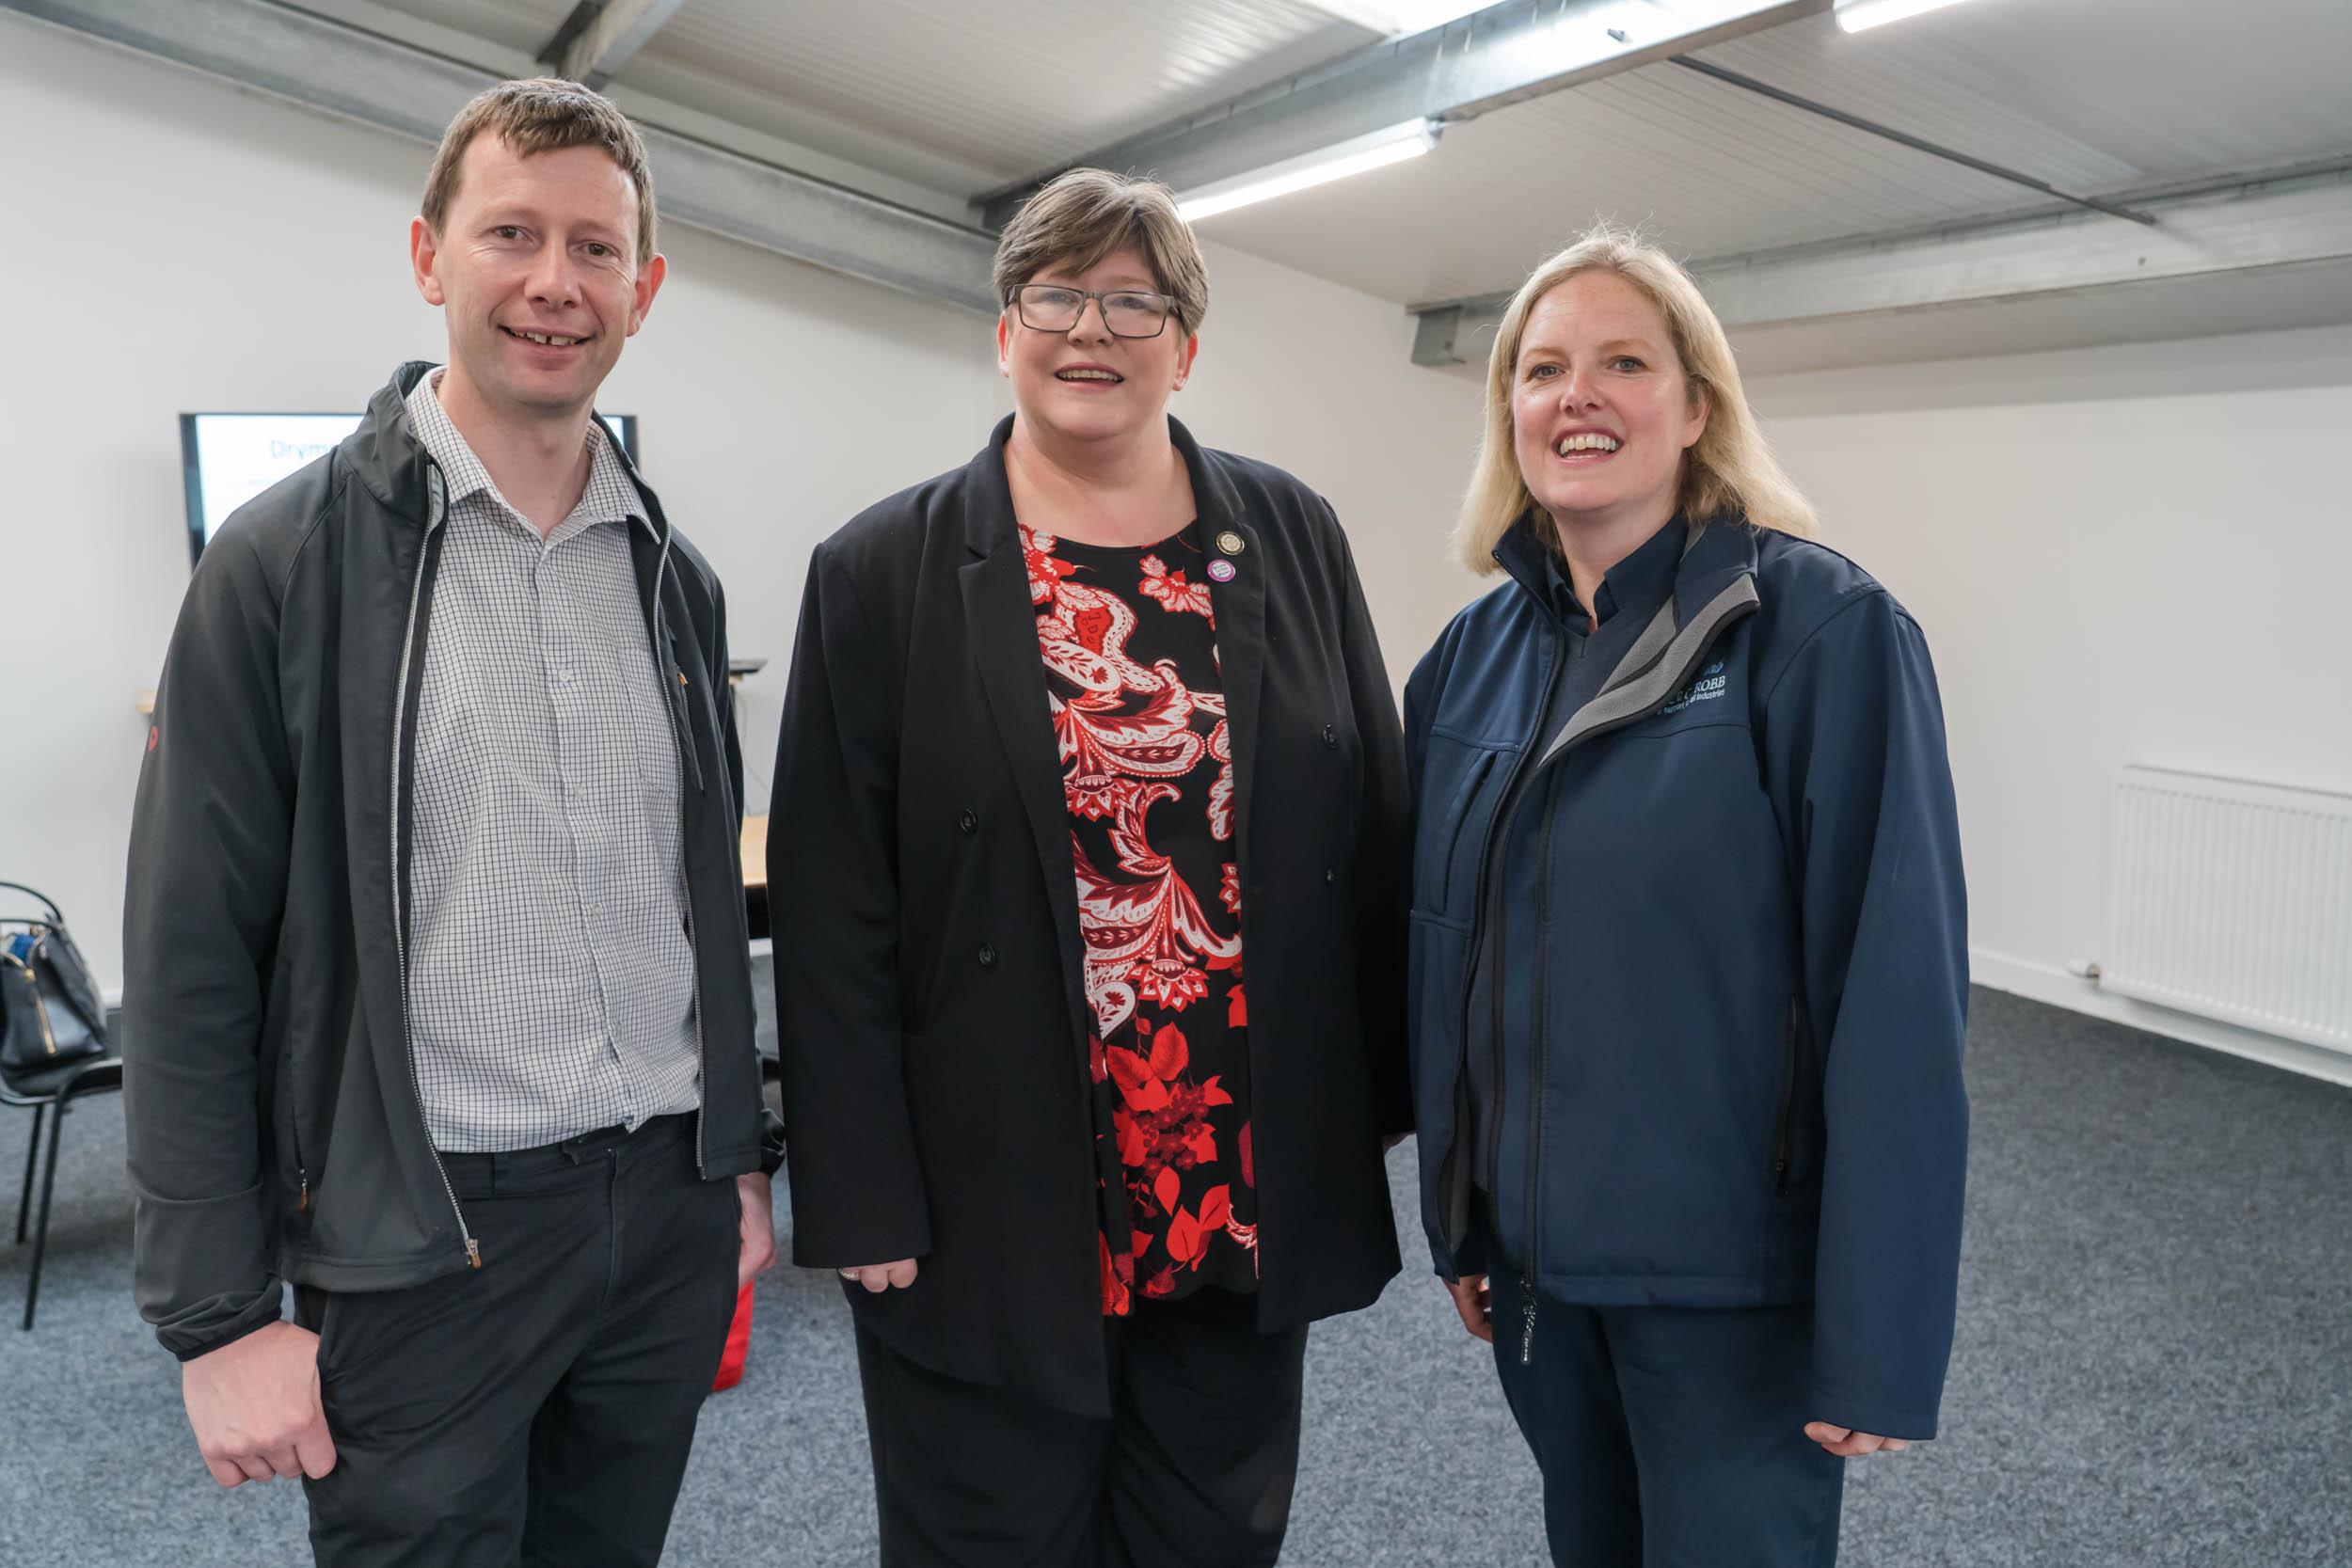 Stuart Mains, Loch Lomond & The Trossachs National Park and Tracey Patrick Depute Head, Balfron High School